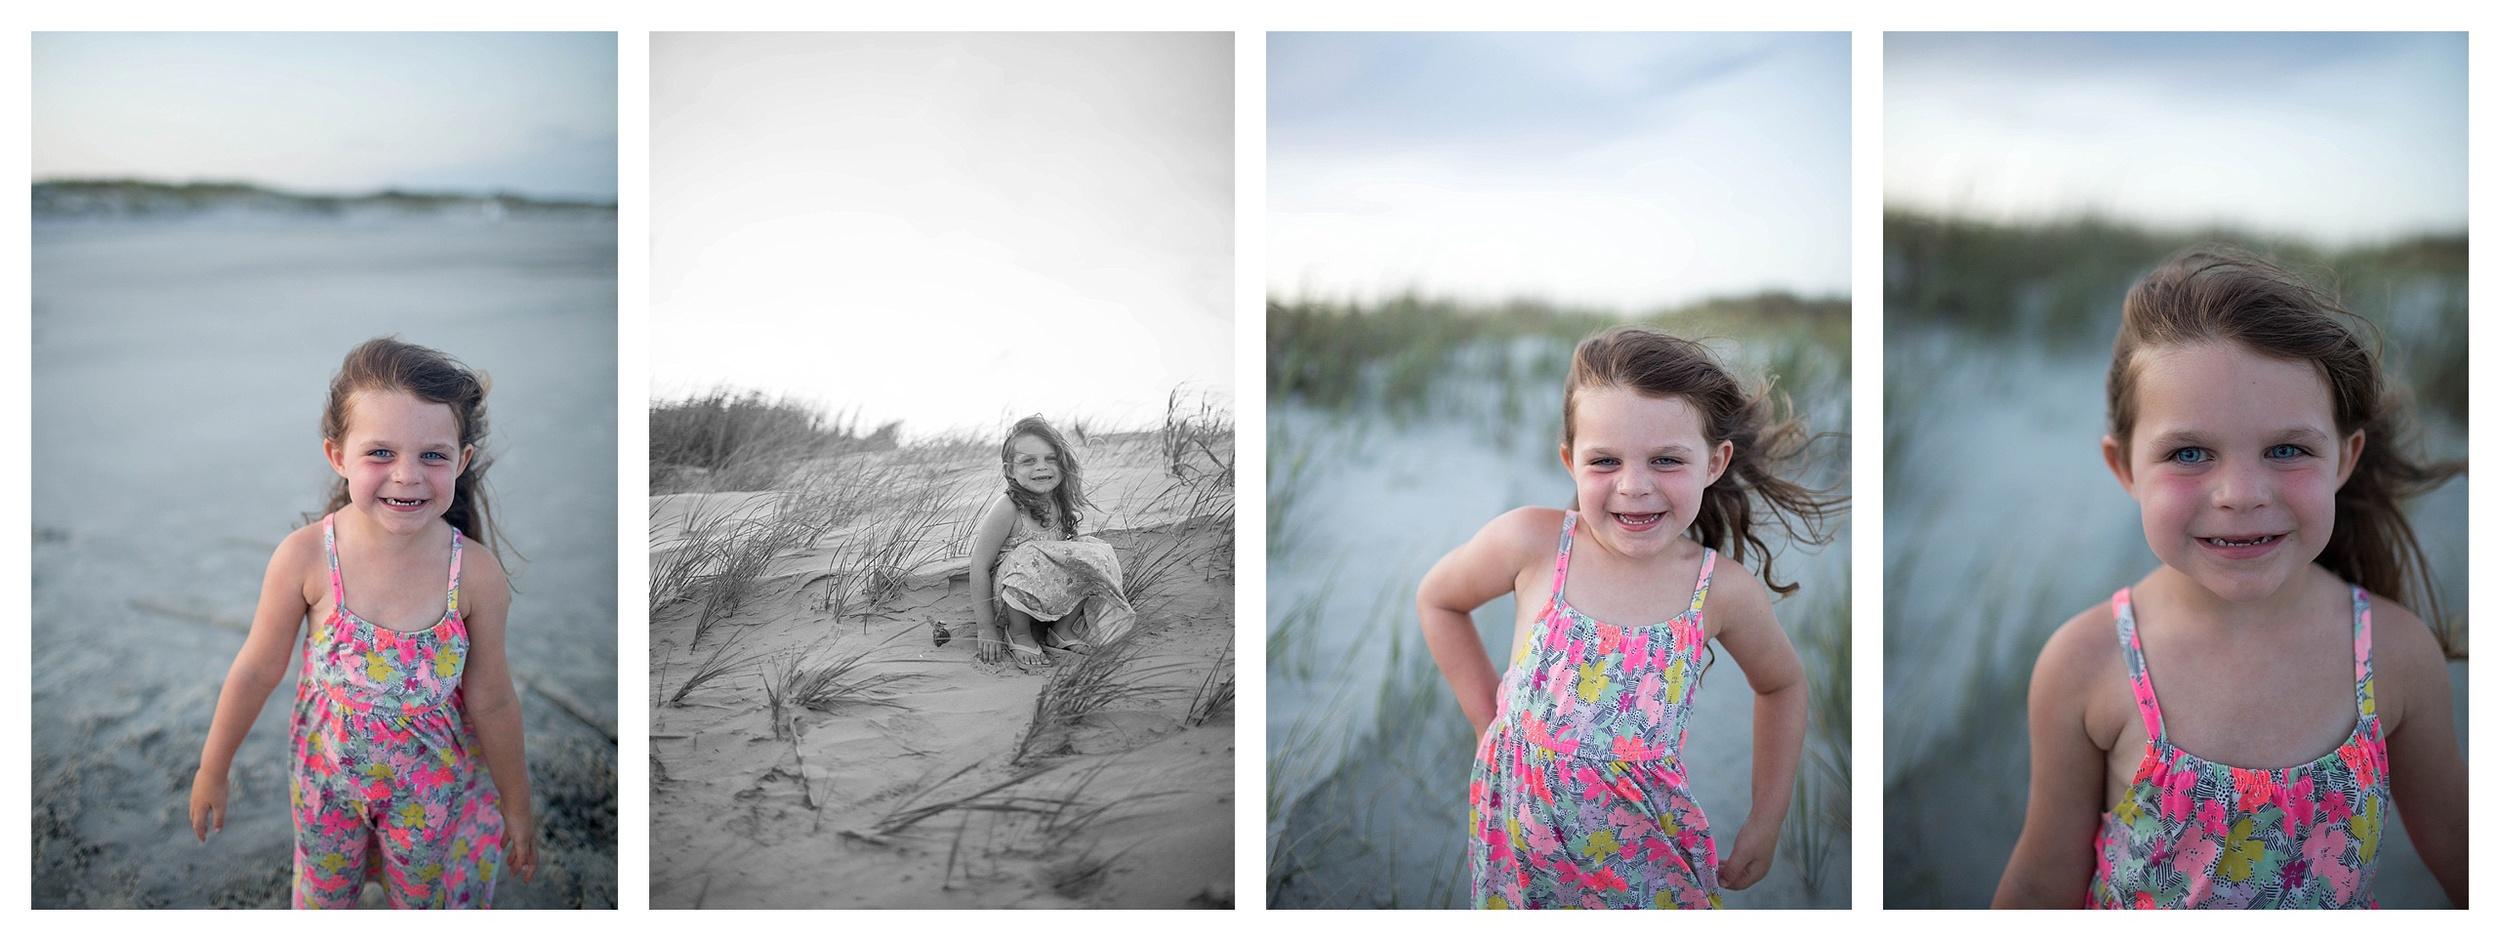 Sunset Beach, NC Wedding and Portrait Photographer || Ashley Eiban Photography || www.ashleyeiban.com